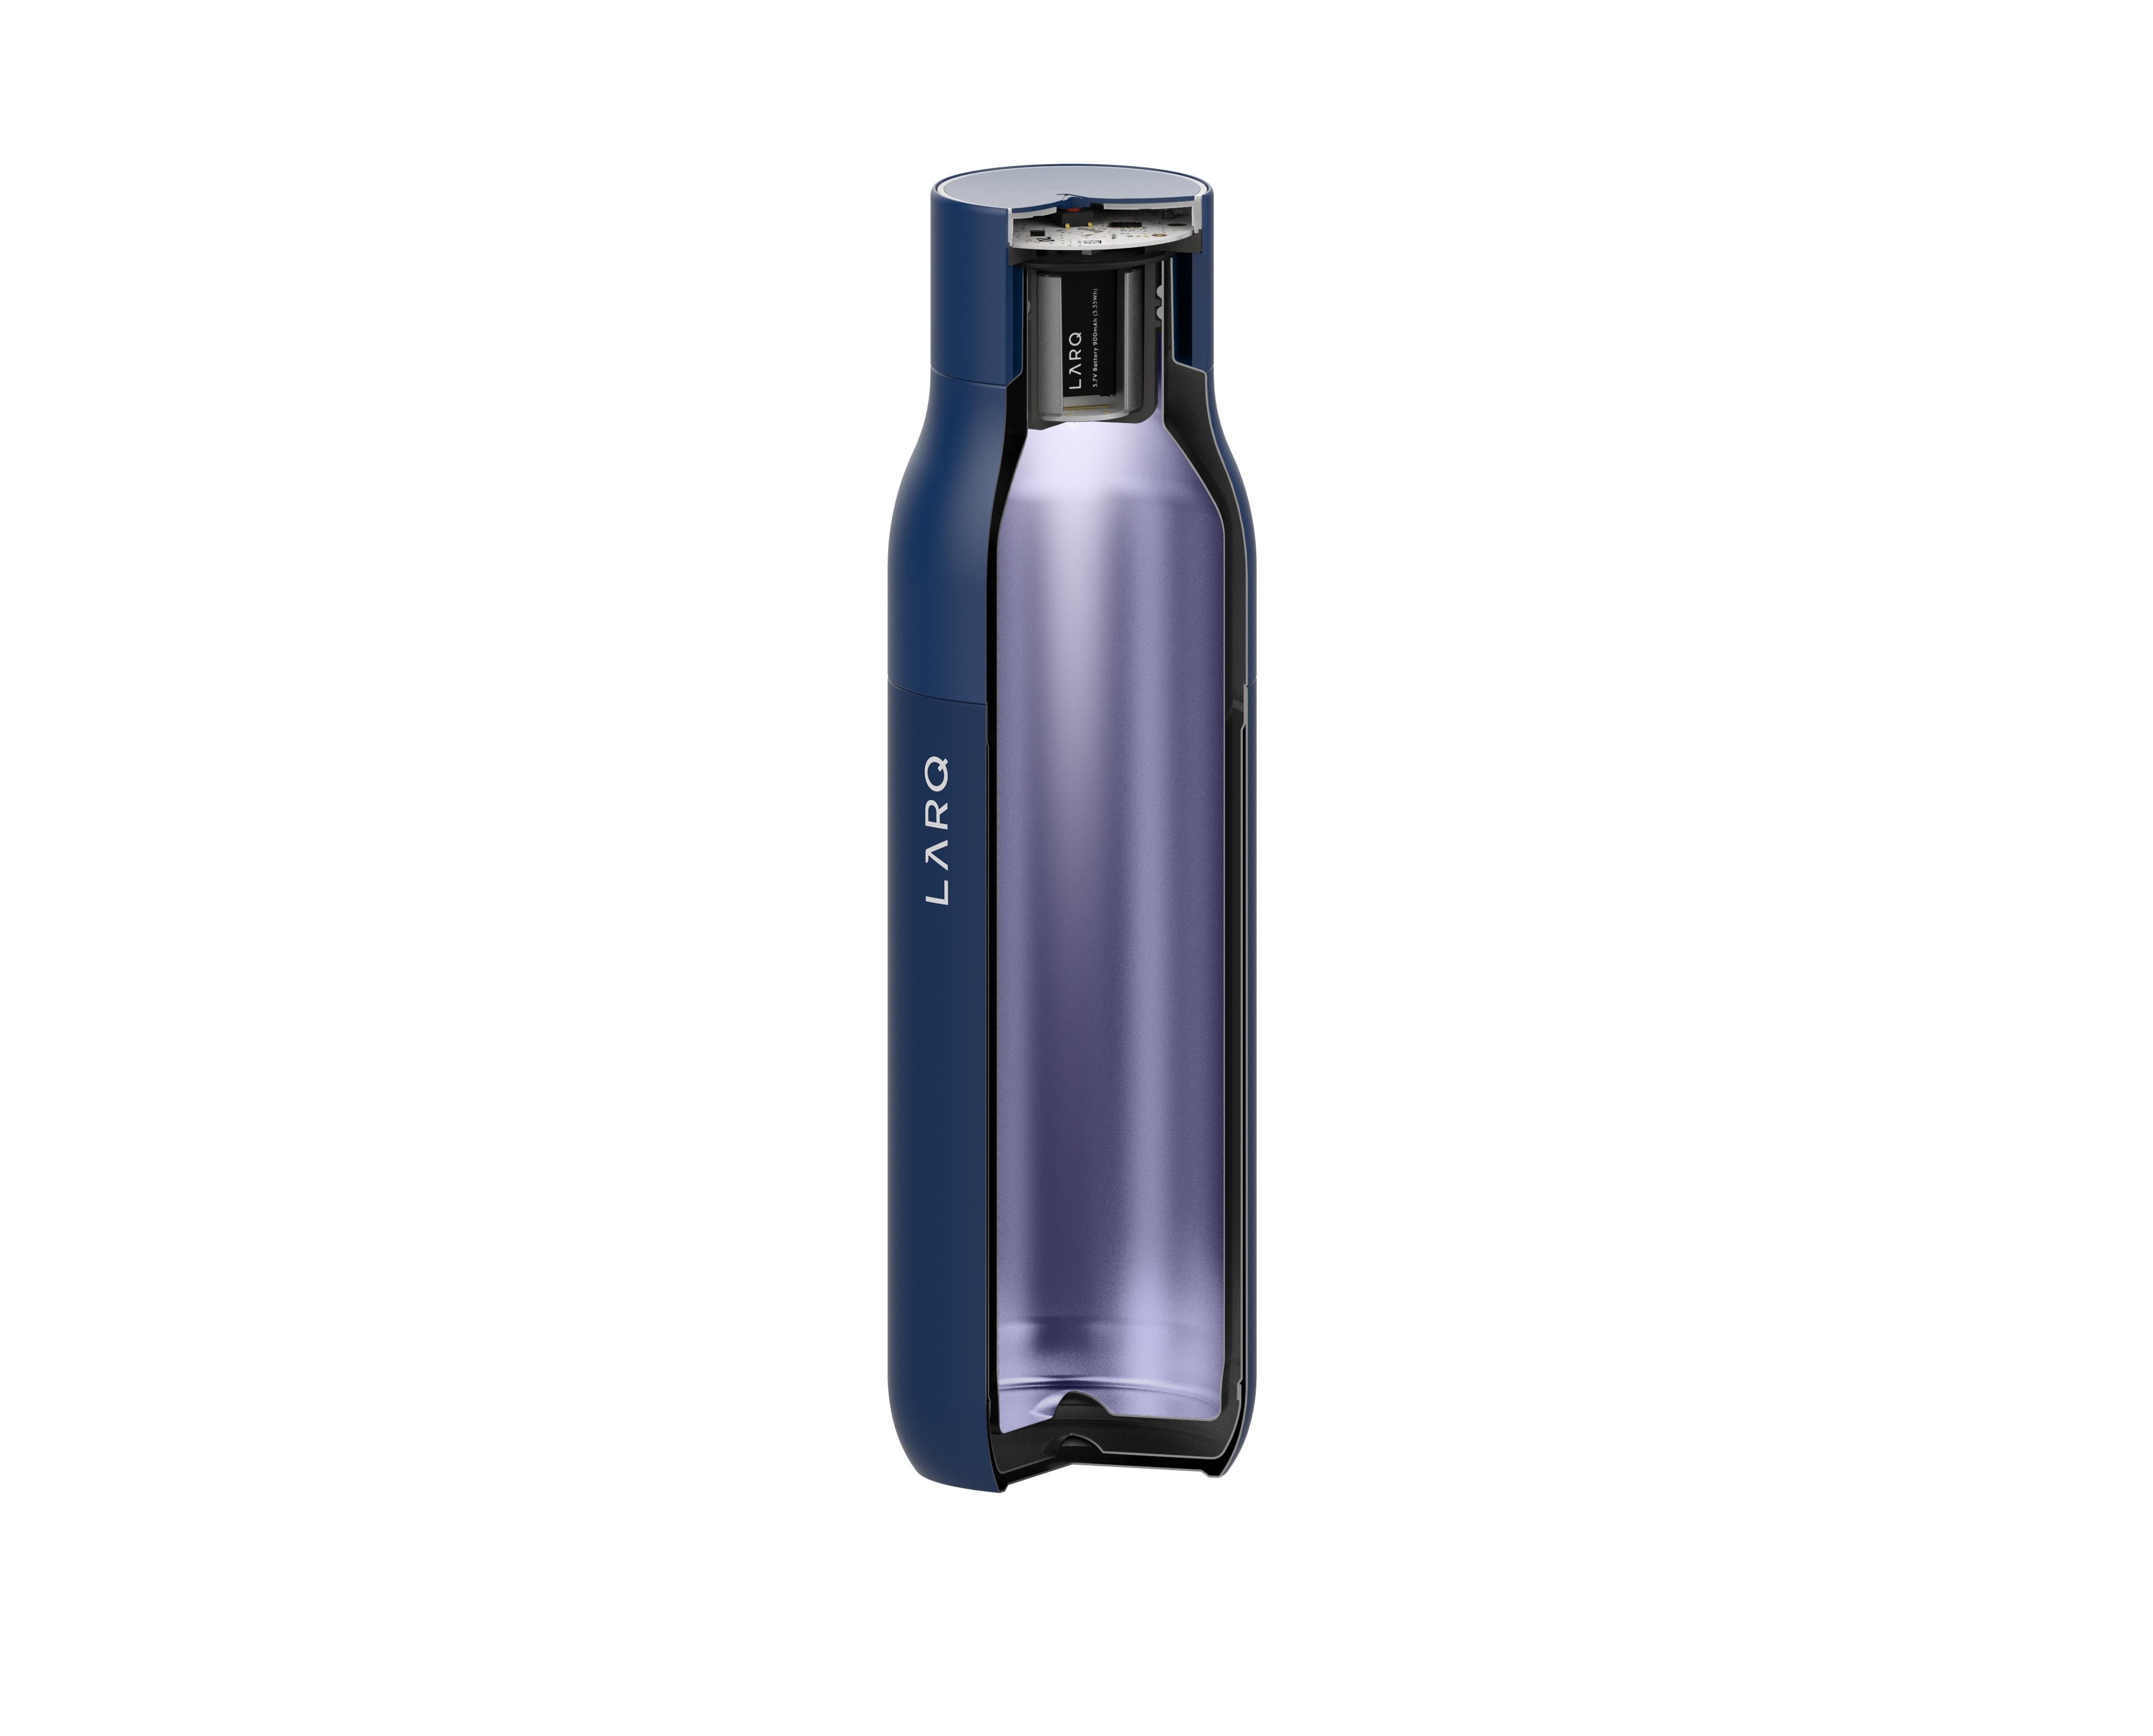 LARQ Bottle opened